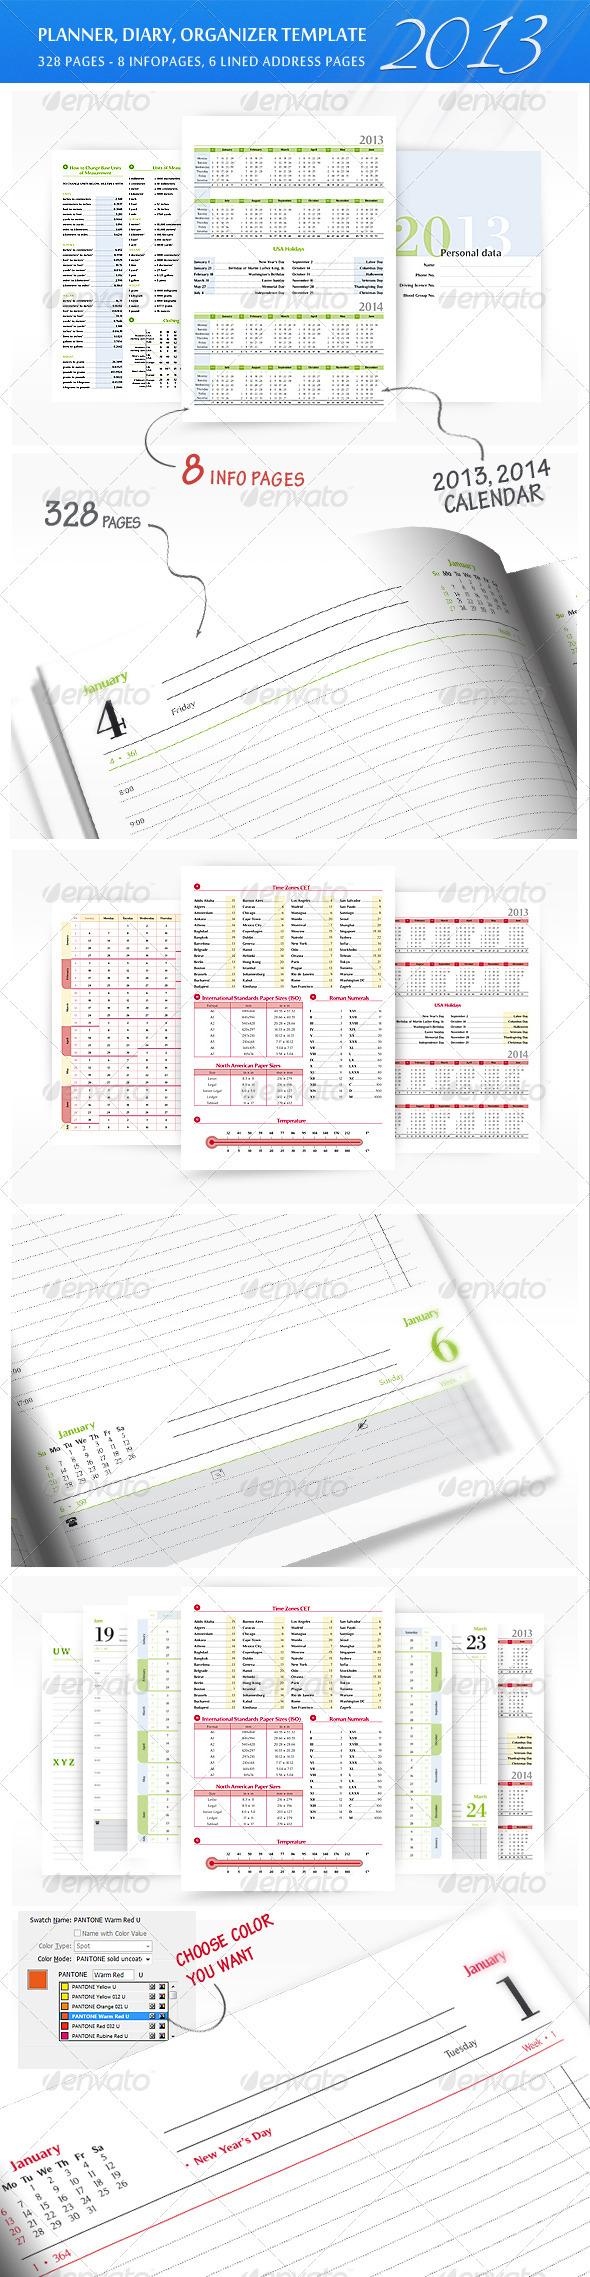 GraphicRiver Planner-Diary-Organizer 2013 2775561